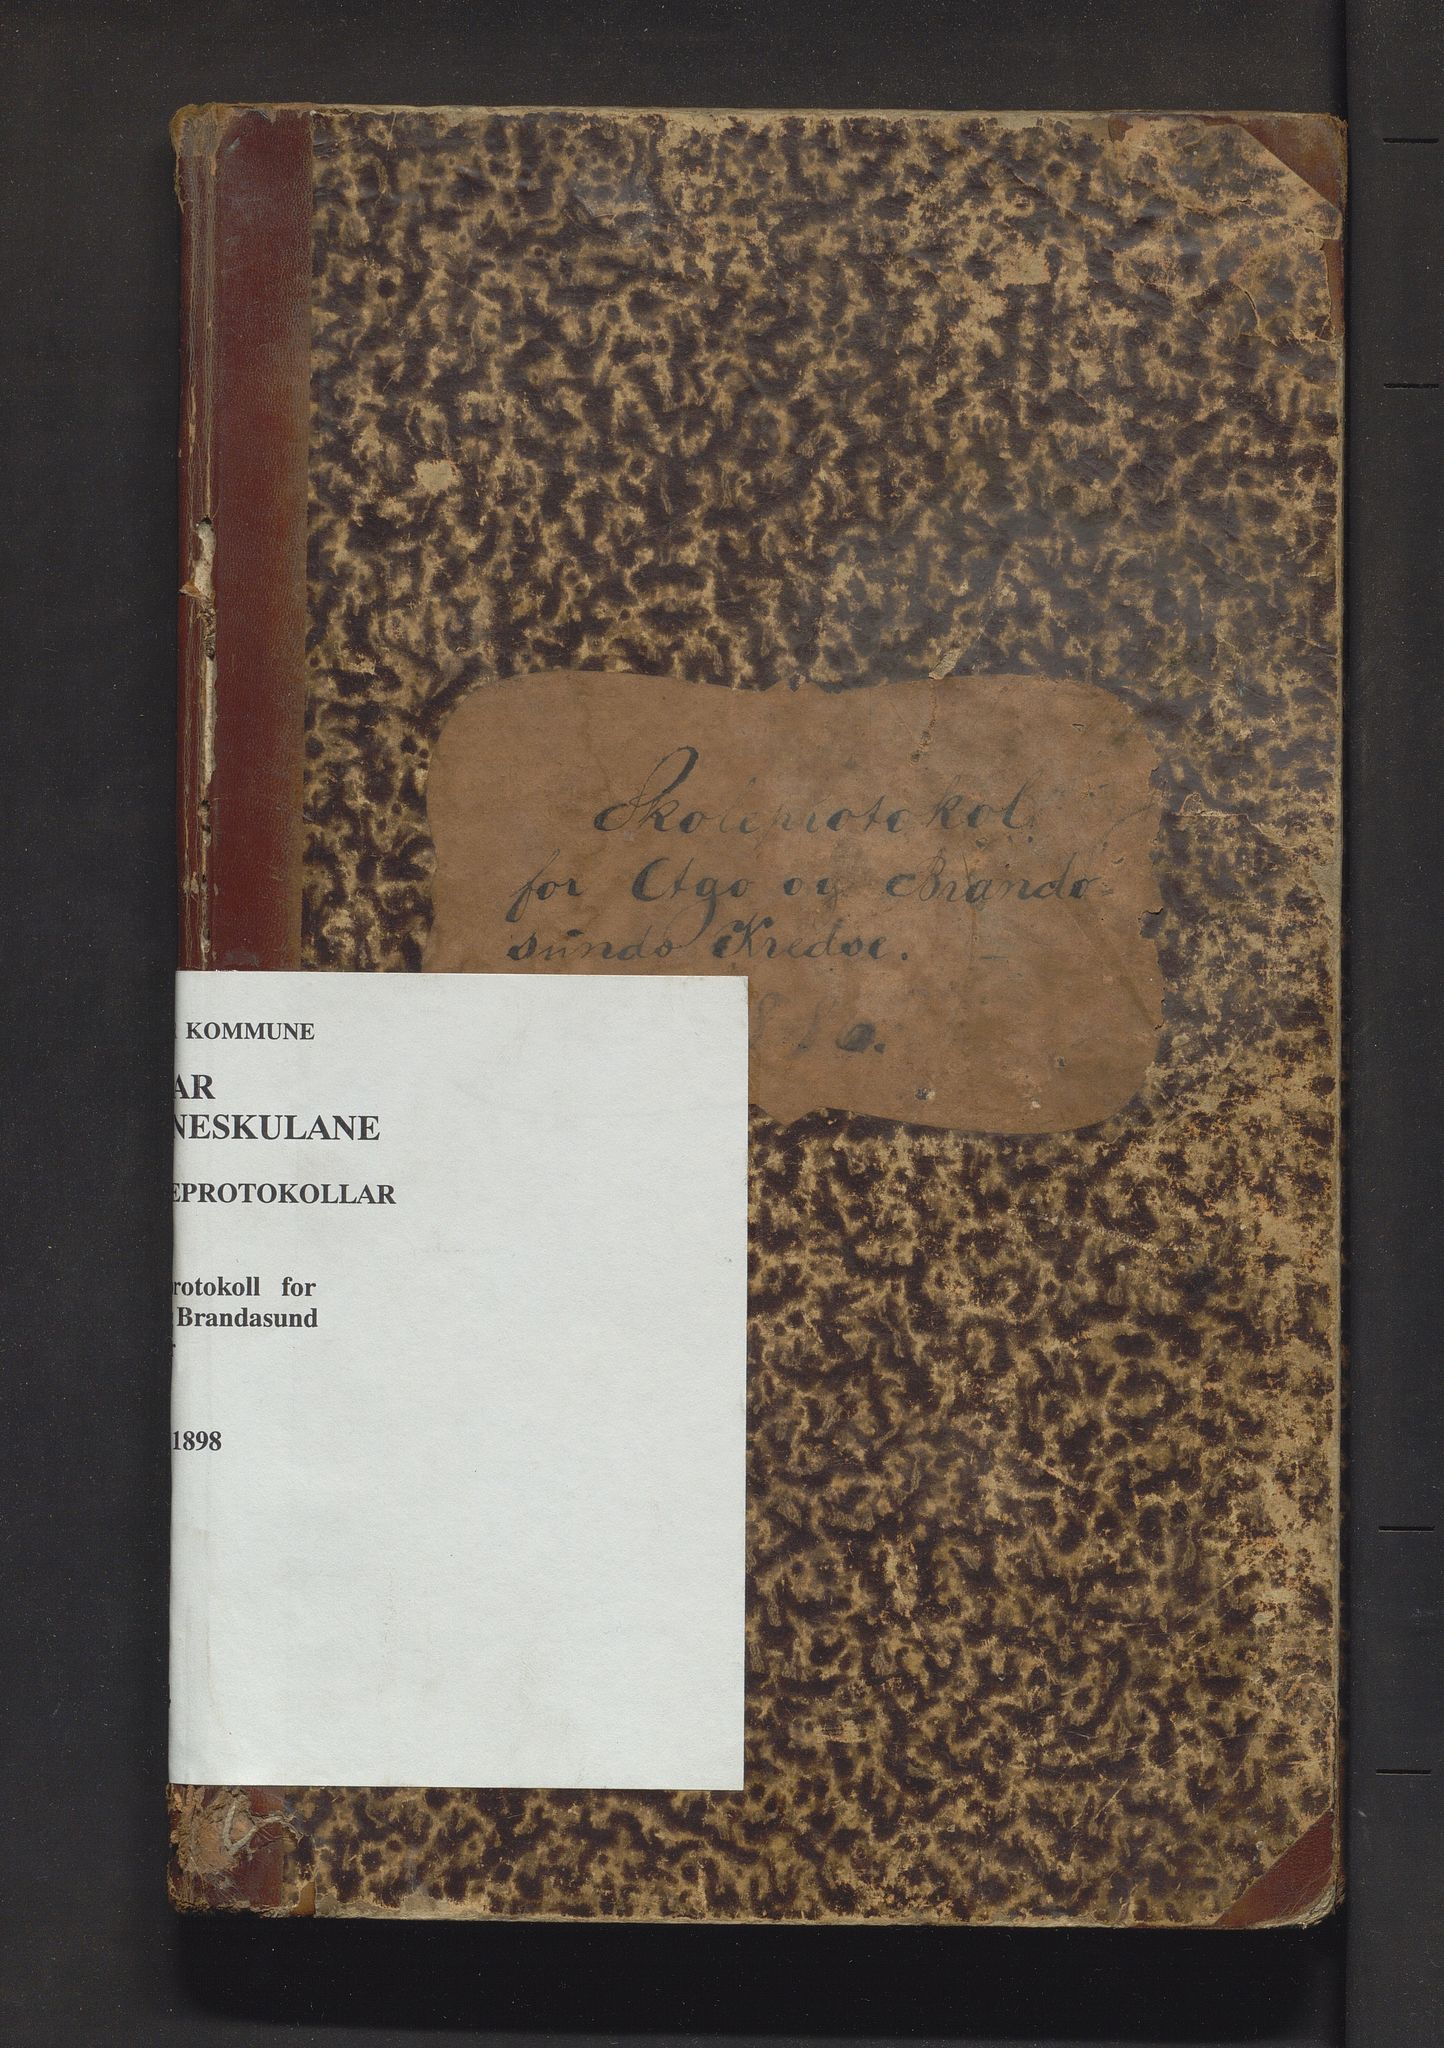 IKAH, Fitjar kommune. Barneskulane, F/Fa/L0014: Skuleprotokoll for Aga og Brandasund krinsar, 1886-1898